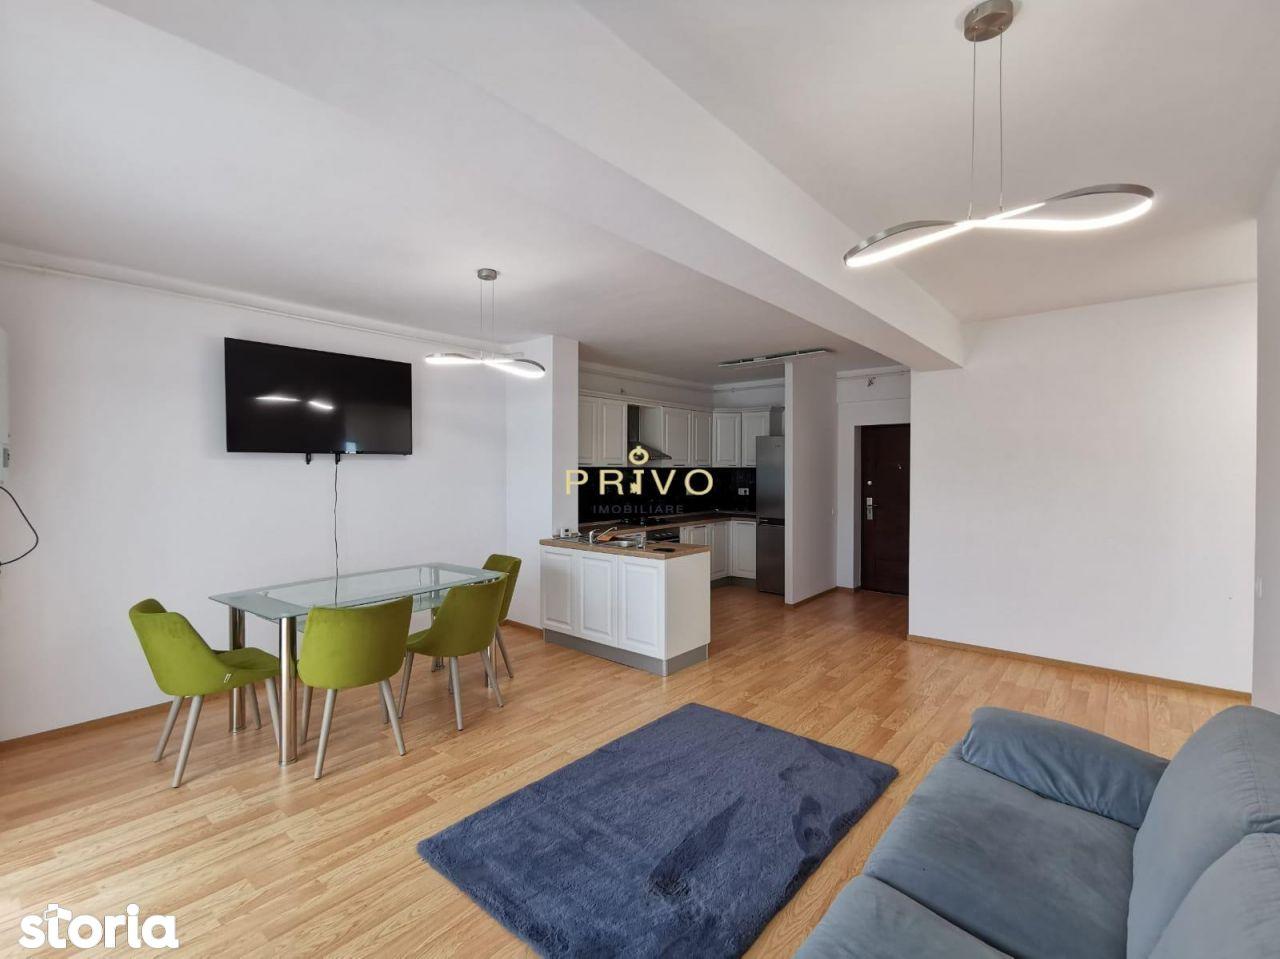 Apartament 2 camere, 55 mp, modern, parcare zona Str, C. Brancusi